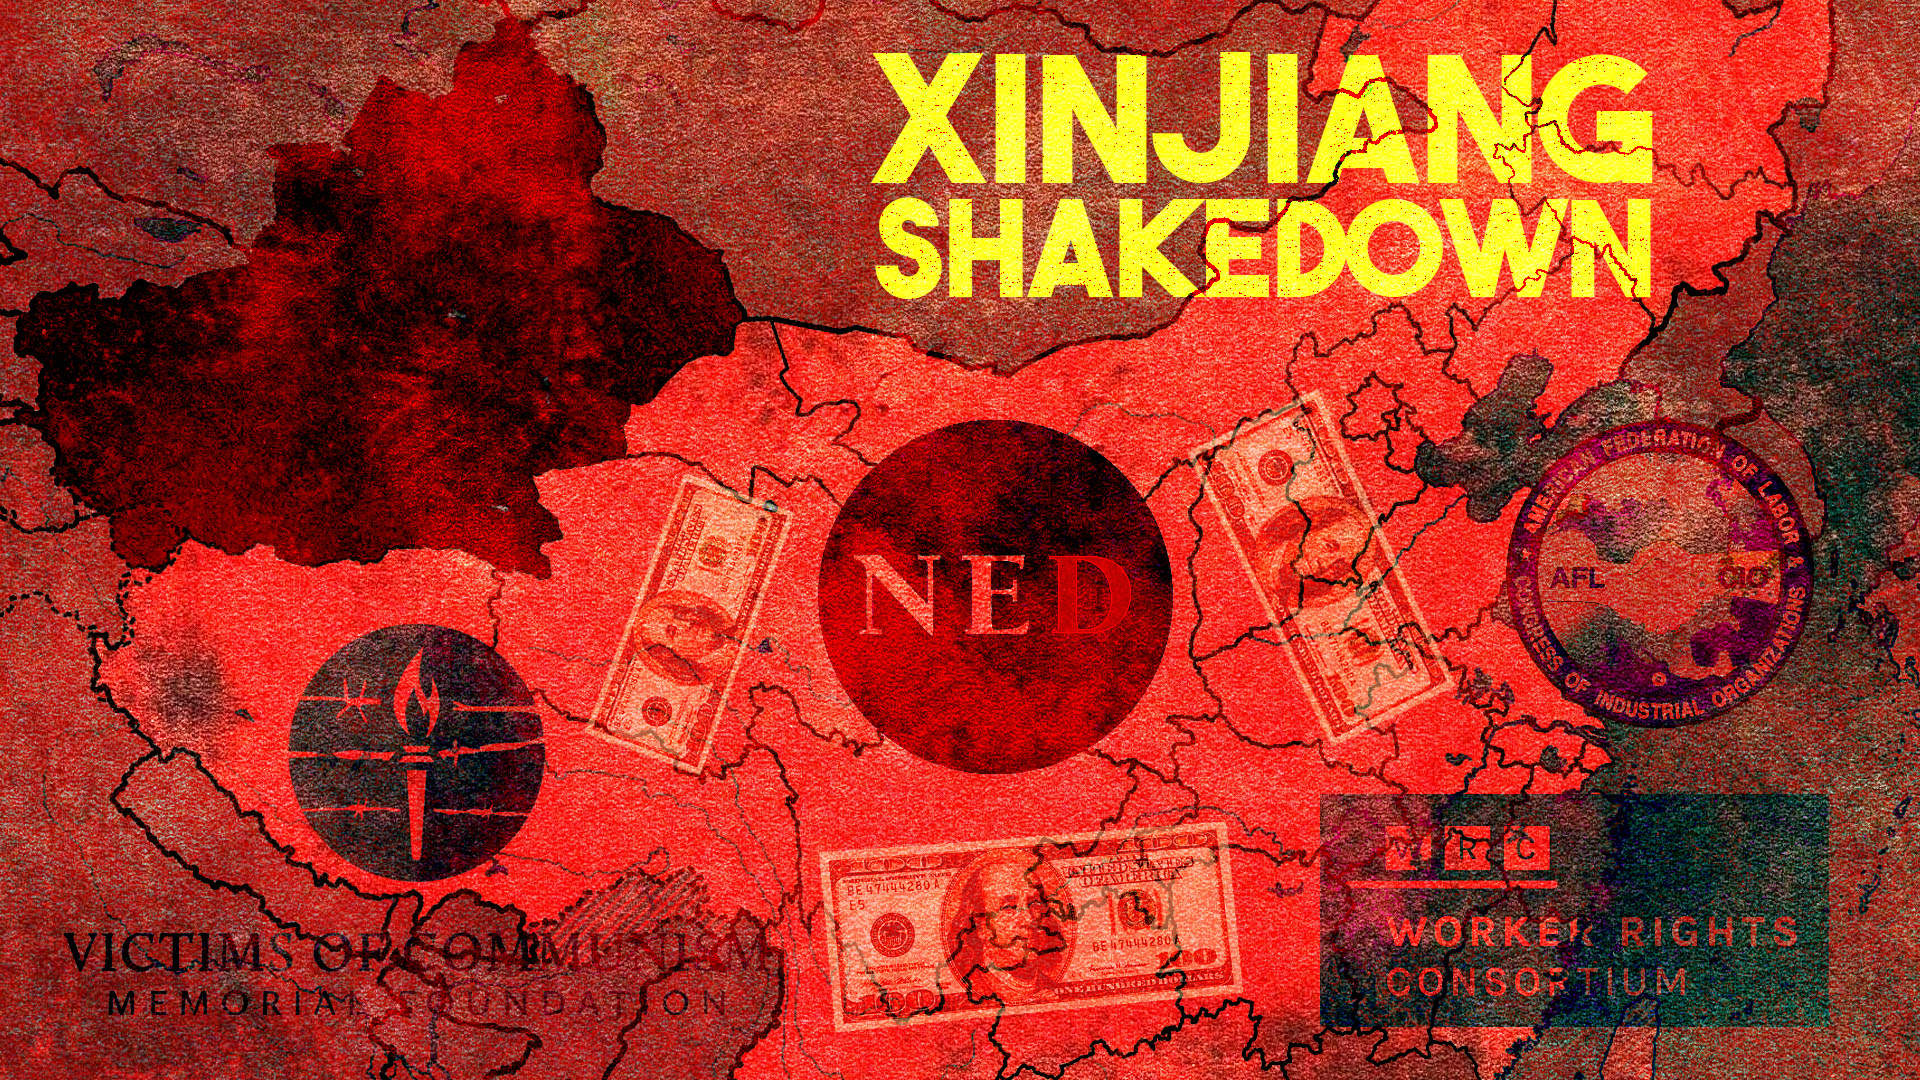 China Xinjiang NED AFL CIO Workers Rights Uighurs